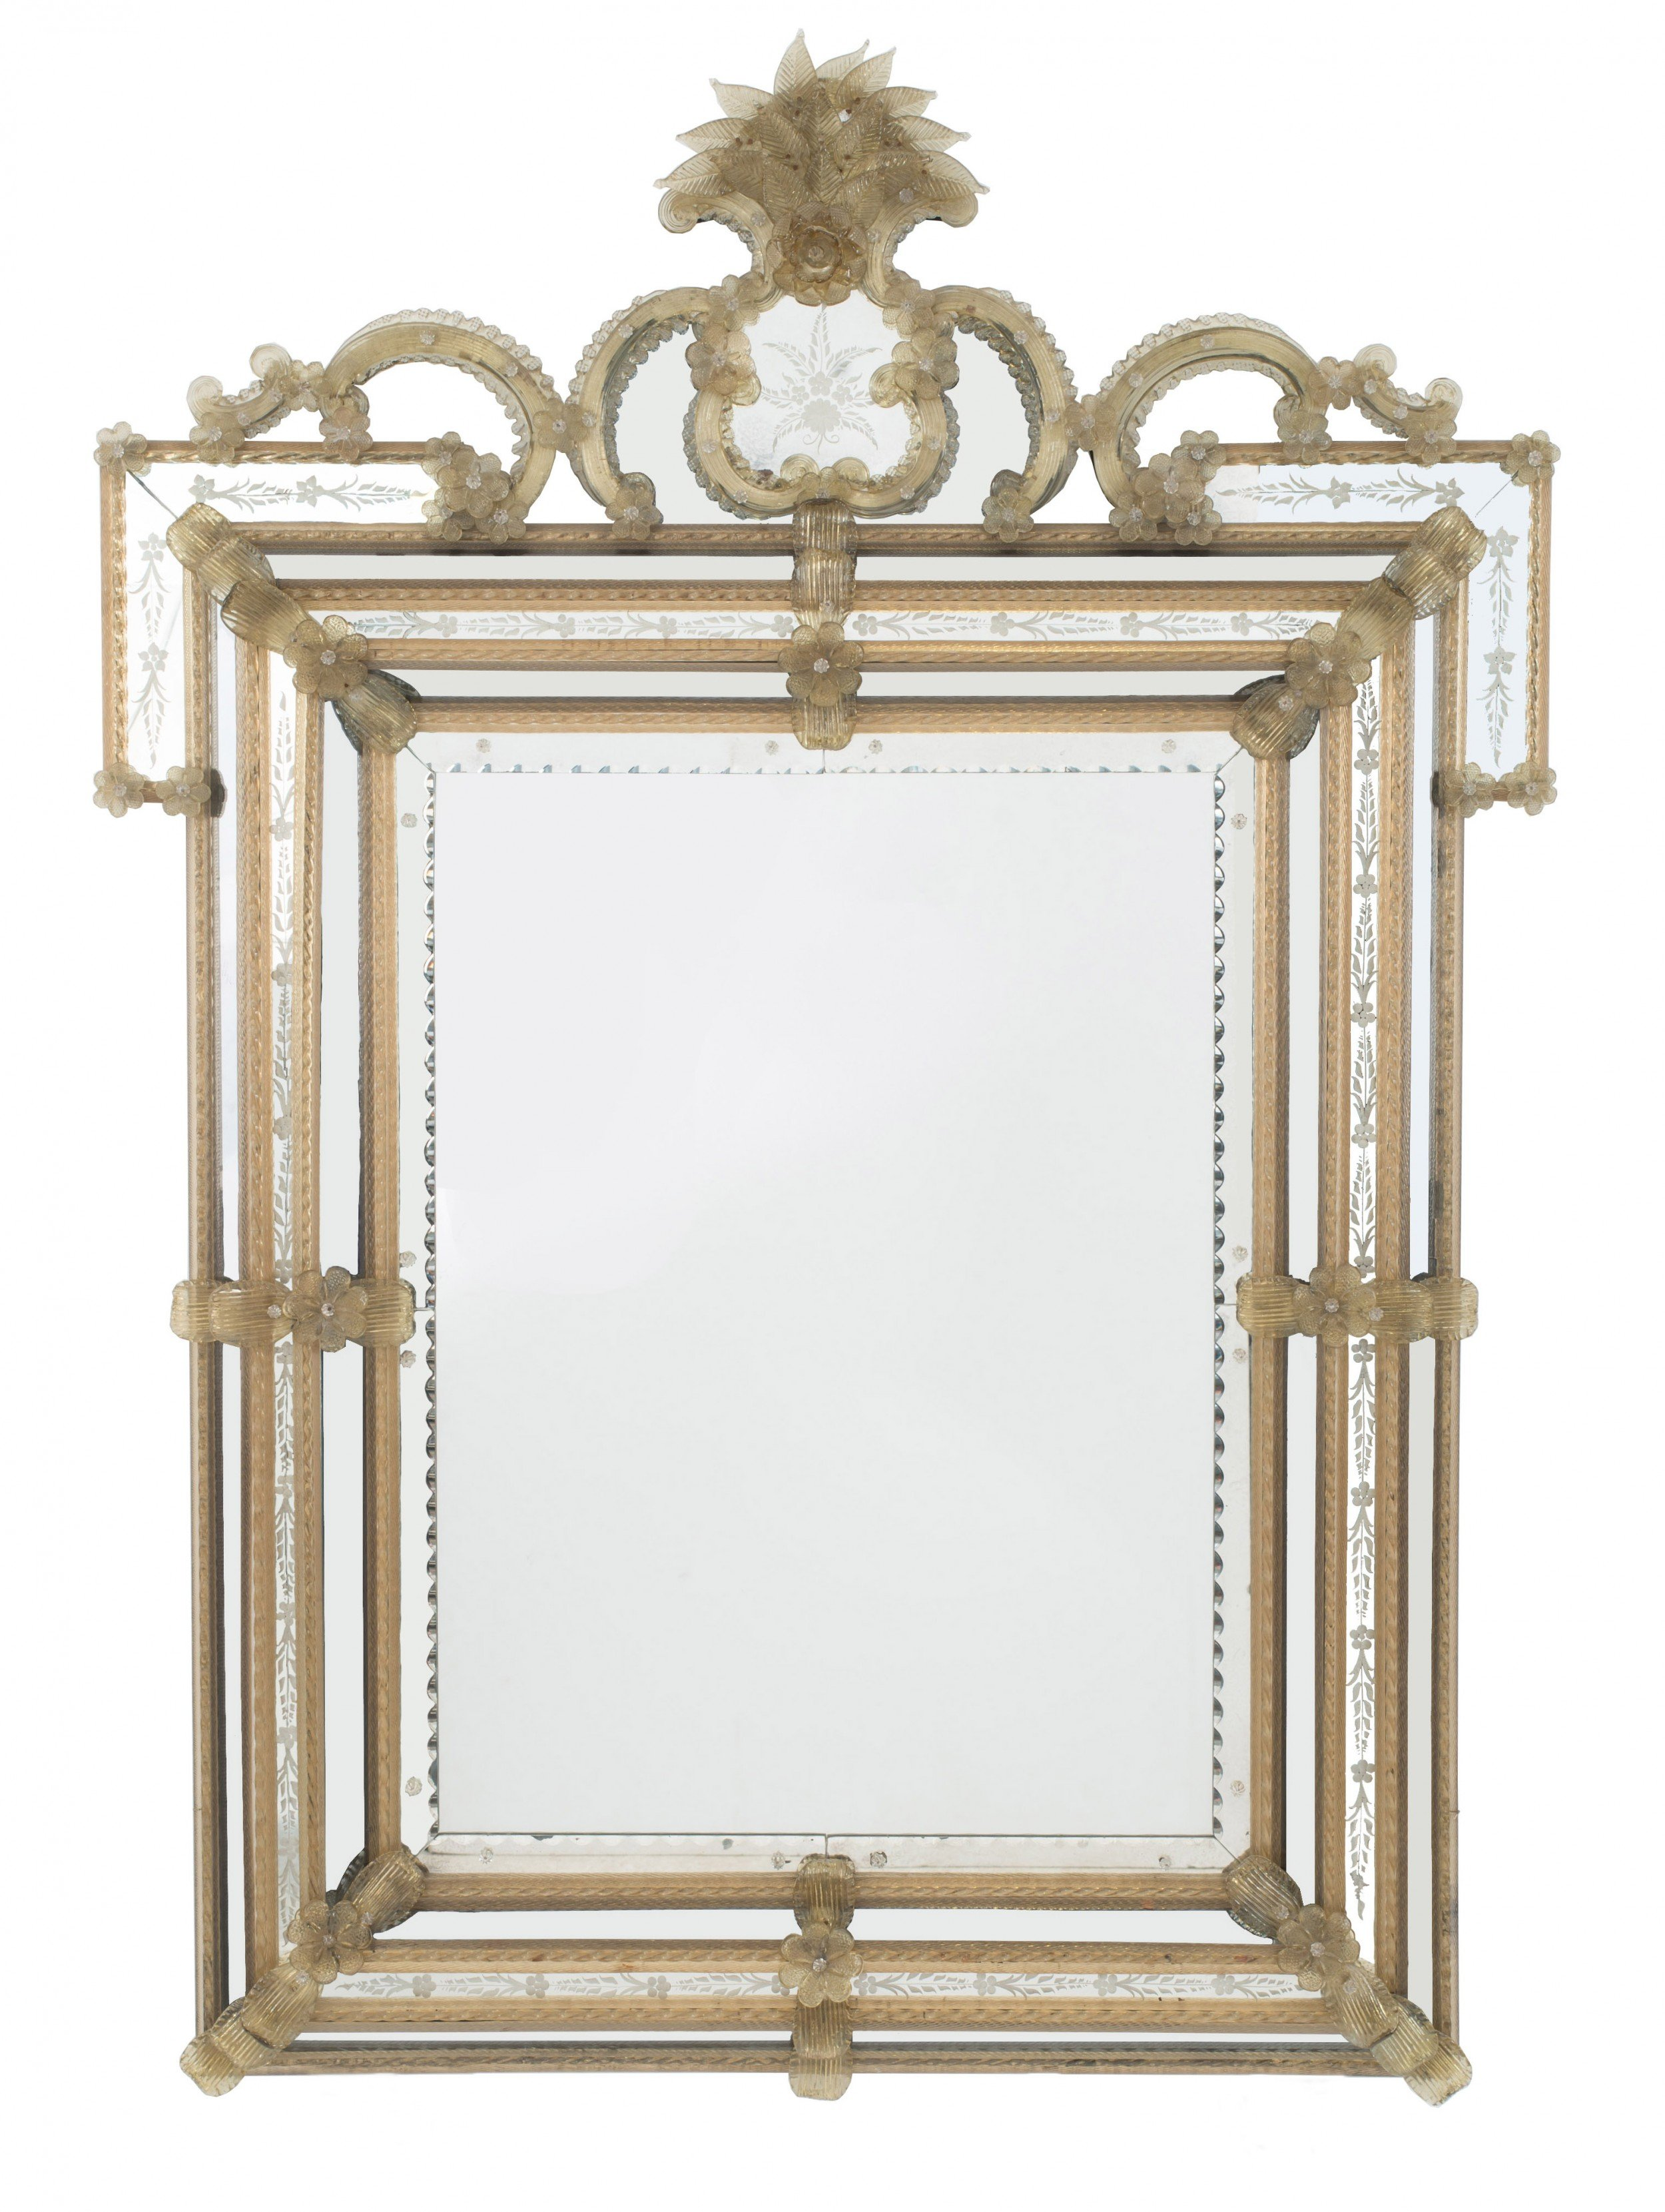 Italian Venetian Style Etched Paneled Wall Mirror 1